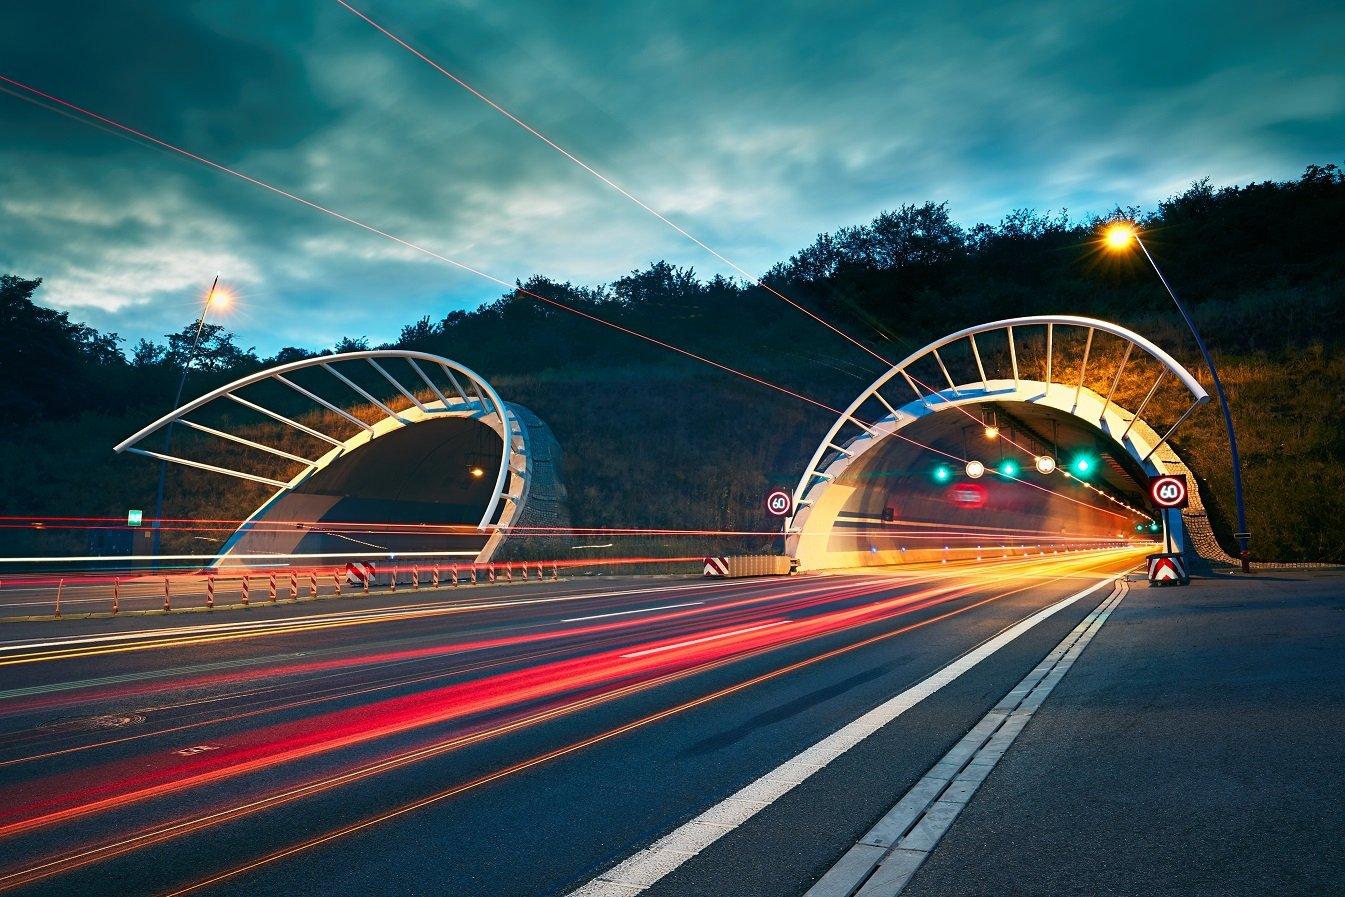 highway-tunnel-at-night-P4AR8HD